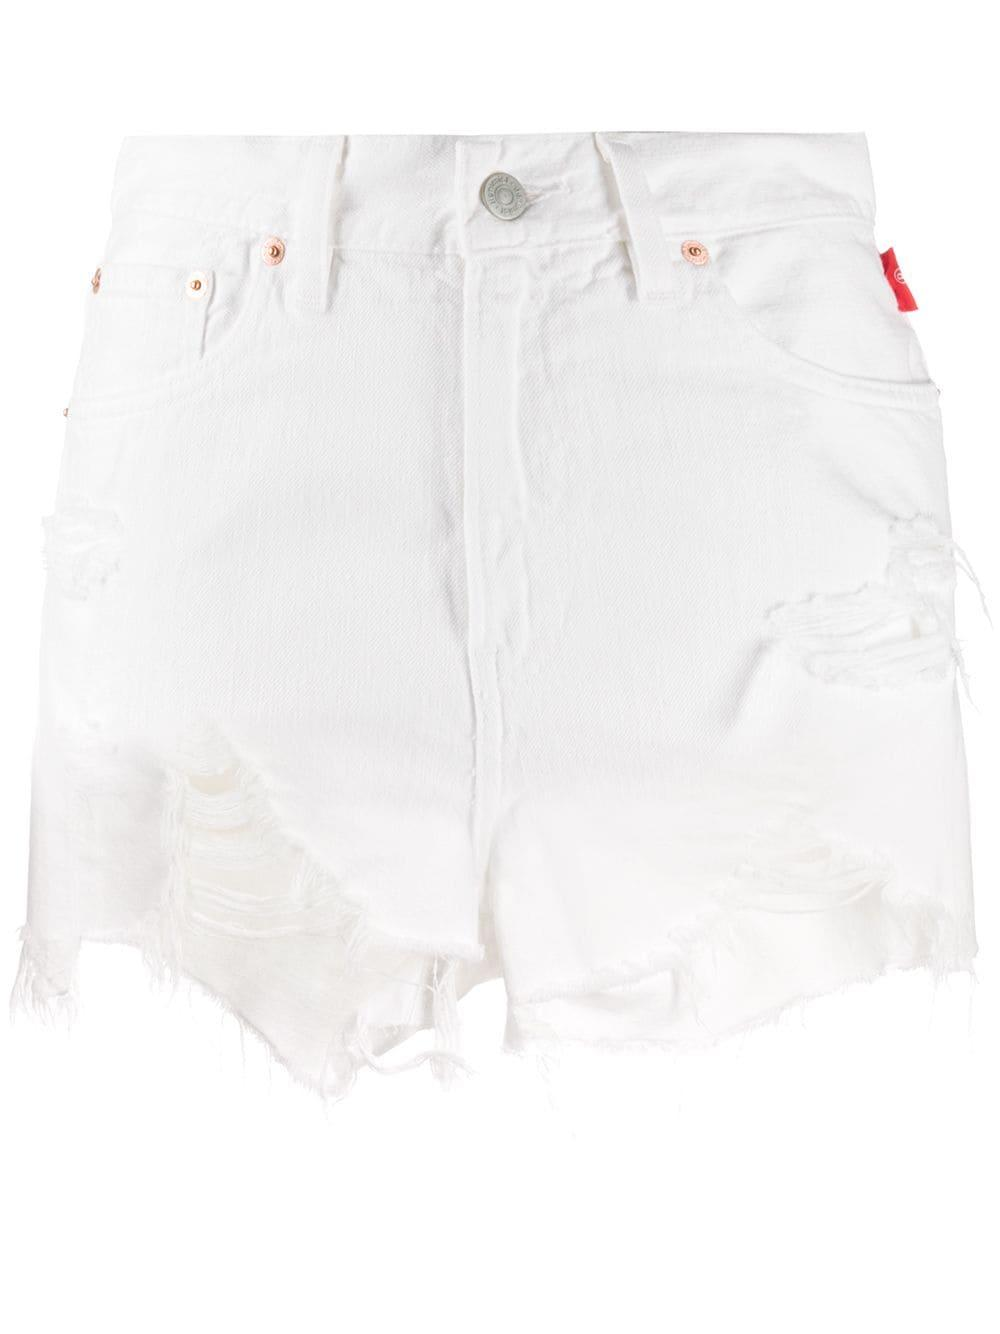 Nic Distressed Hem Cutoff Shorts Item # 2200-502